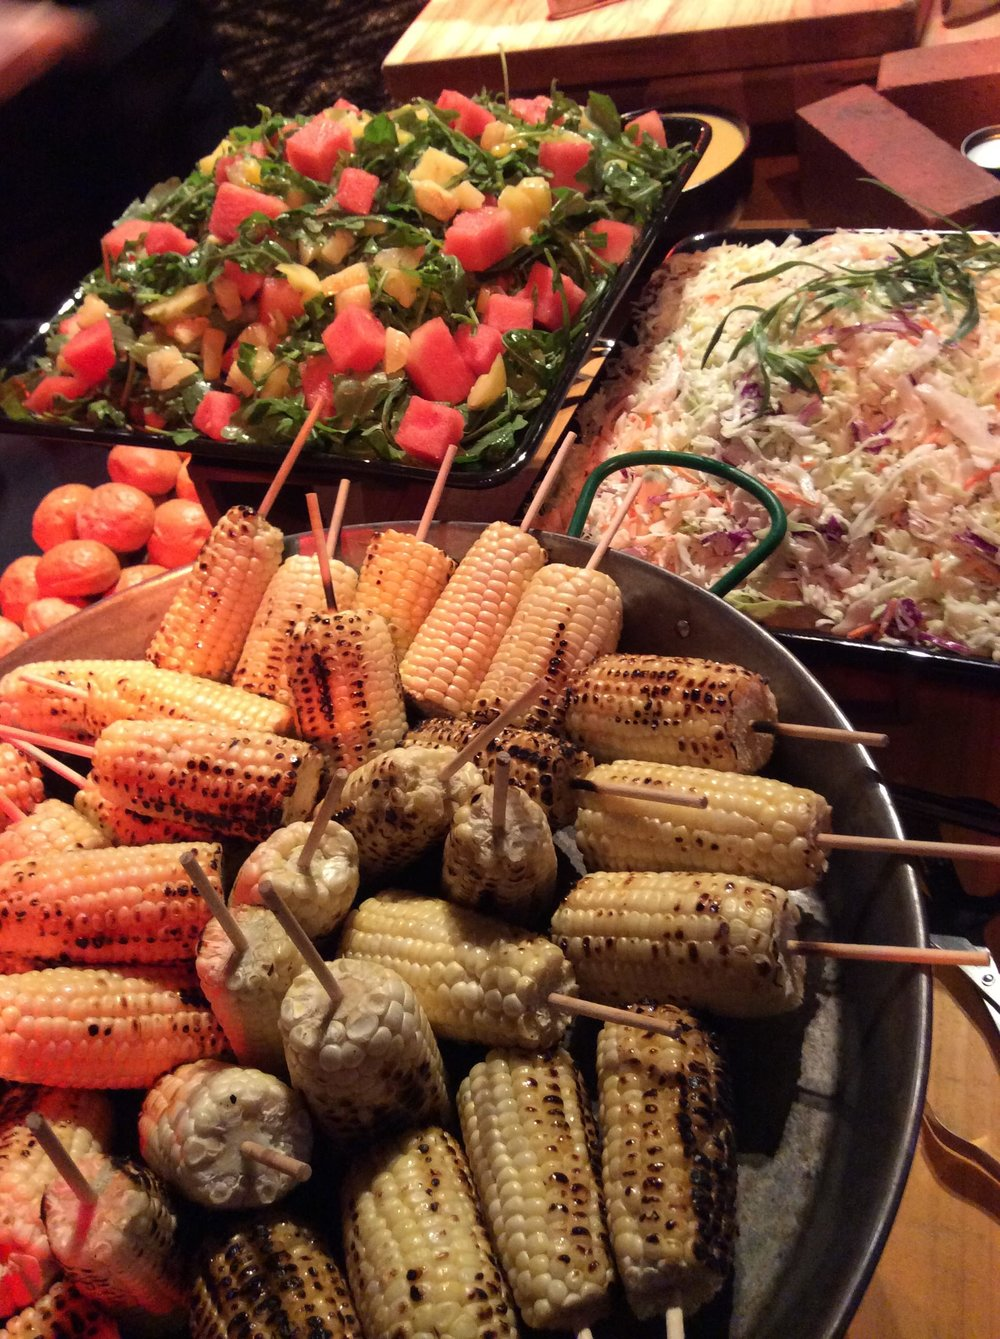 Catering-Los Angeles-Corn on the Cob-Buffet-Watermelon-Arugula.jpg